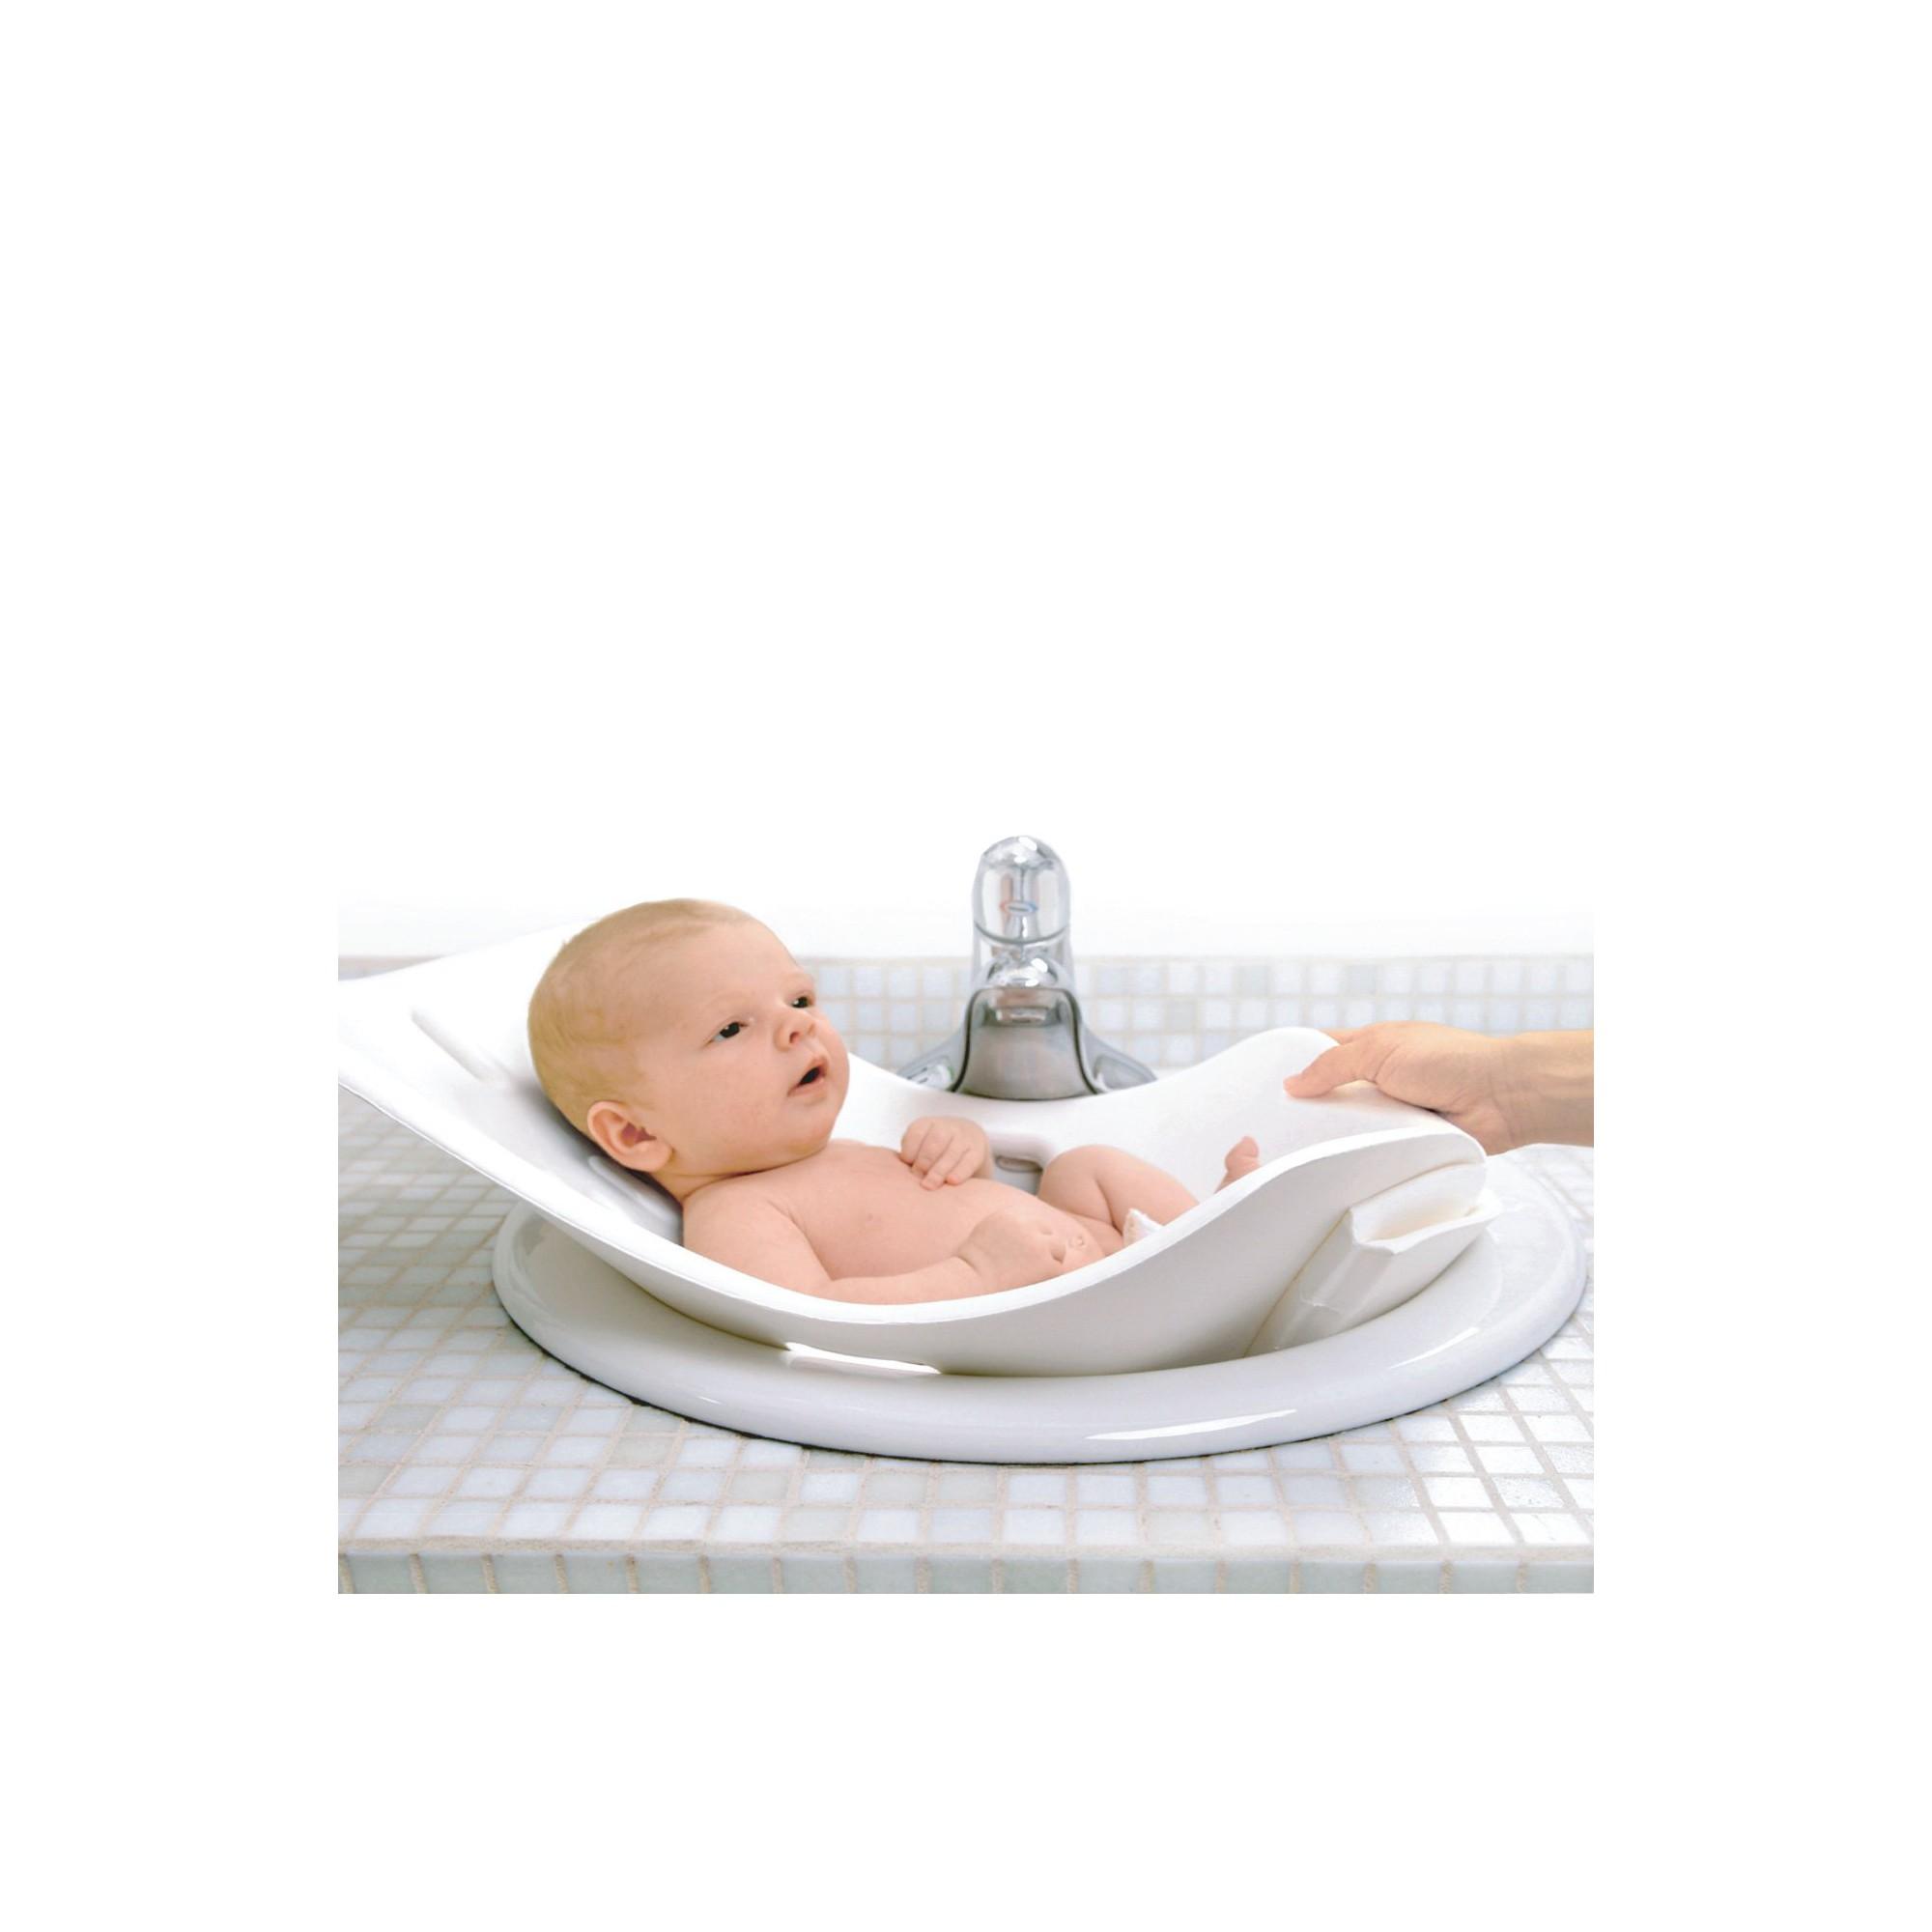 Puj Soft Infant Bath Tub - White | Bath tubs and Products